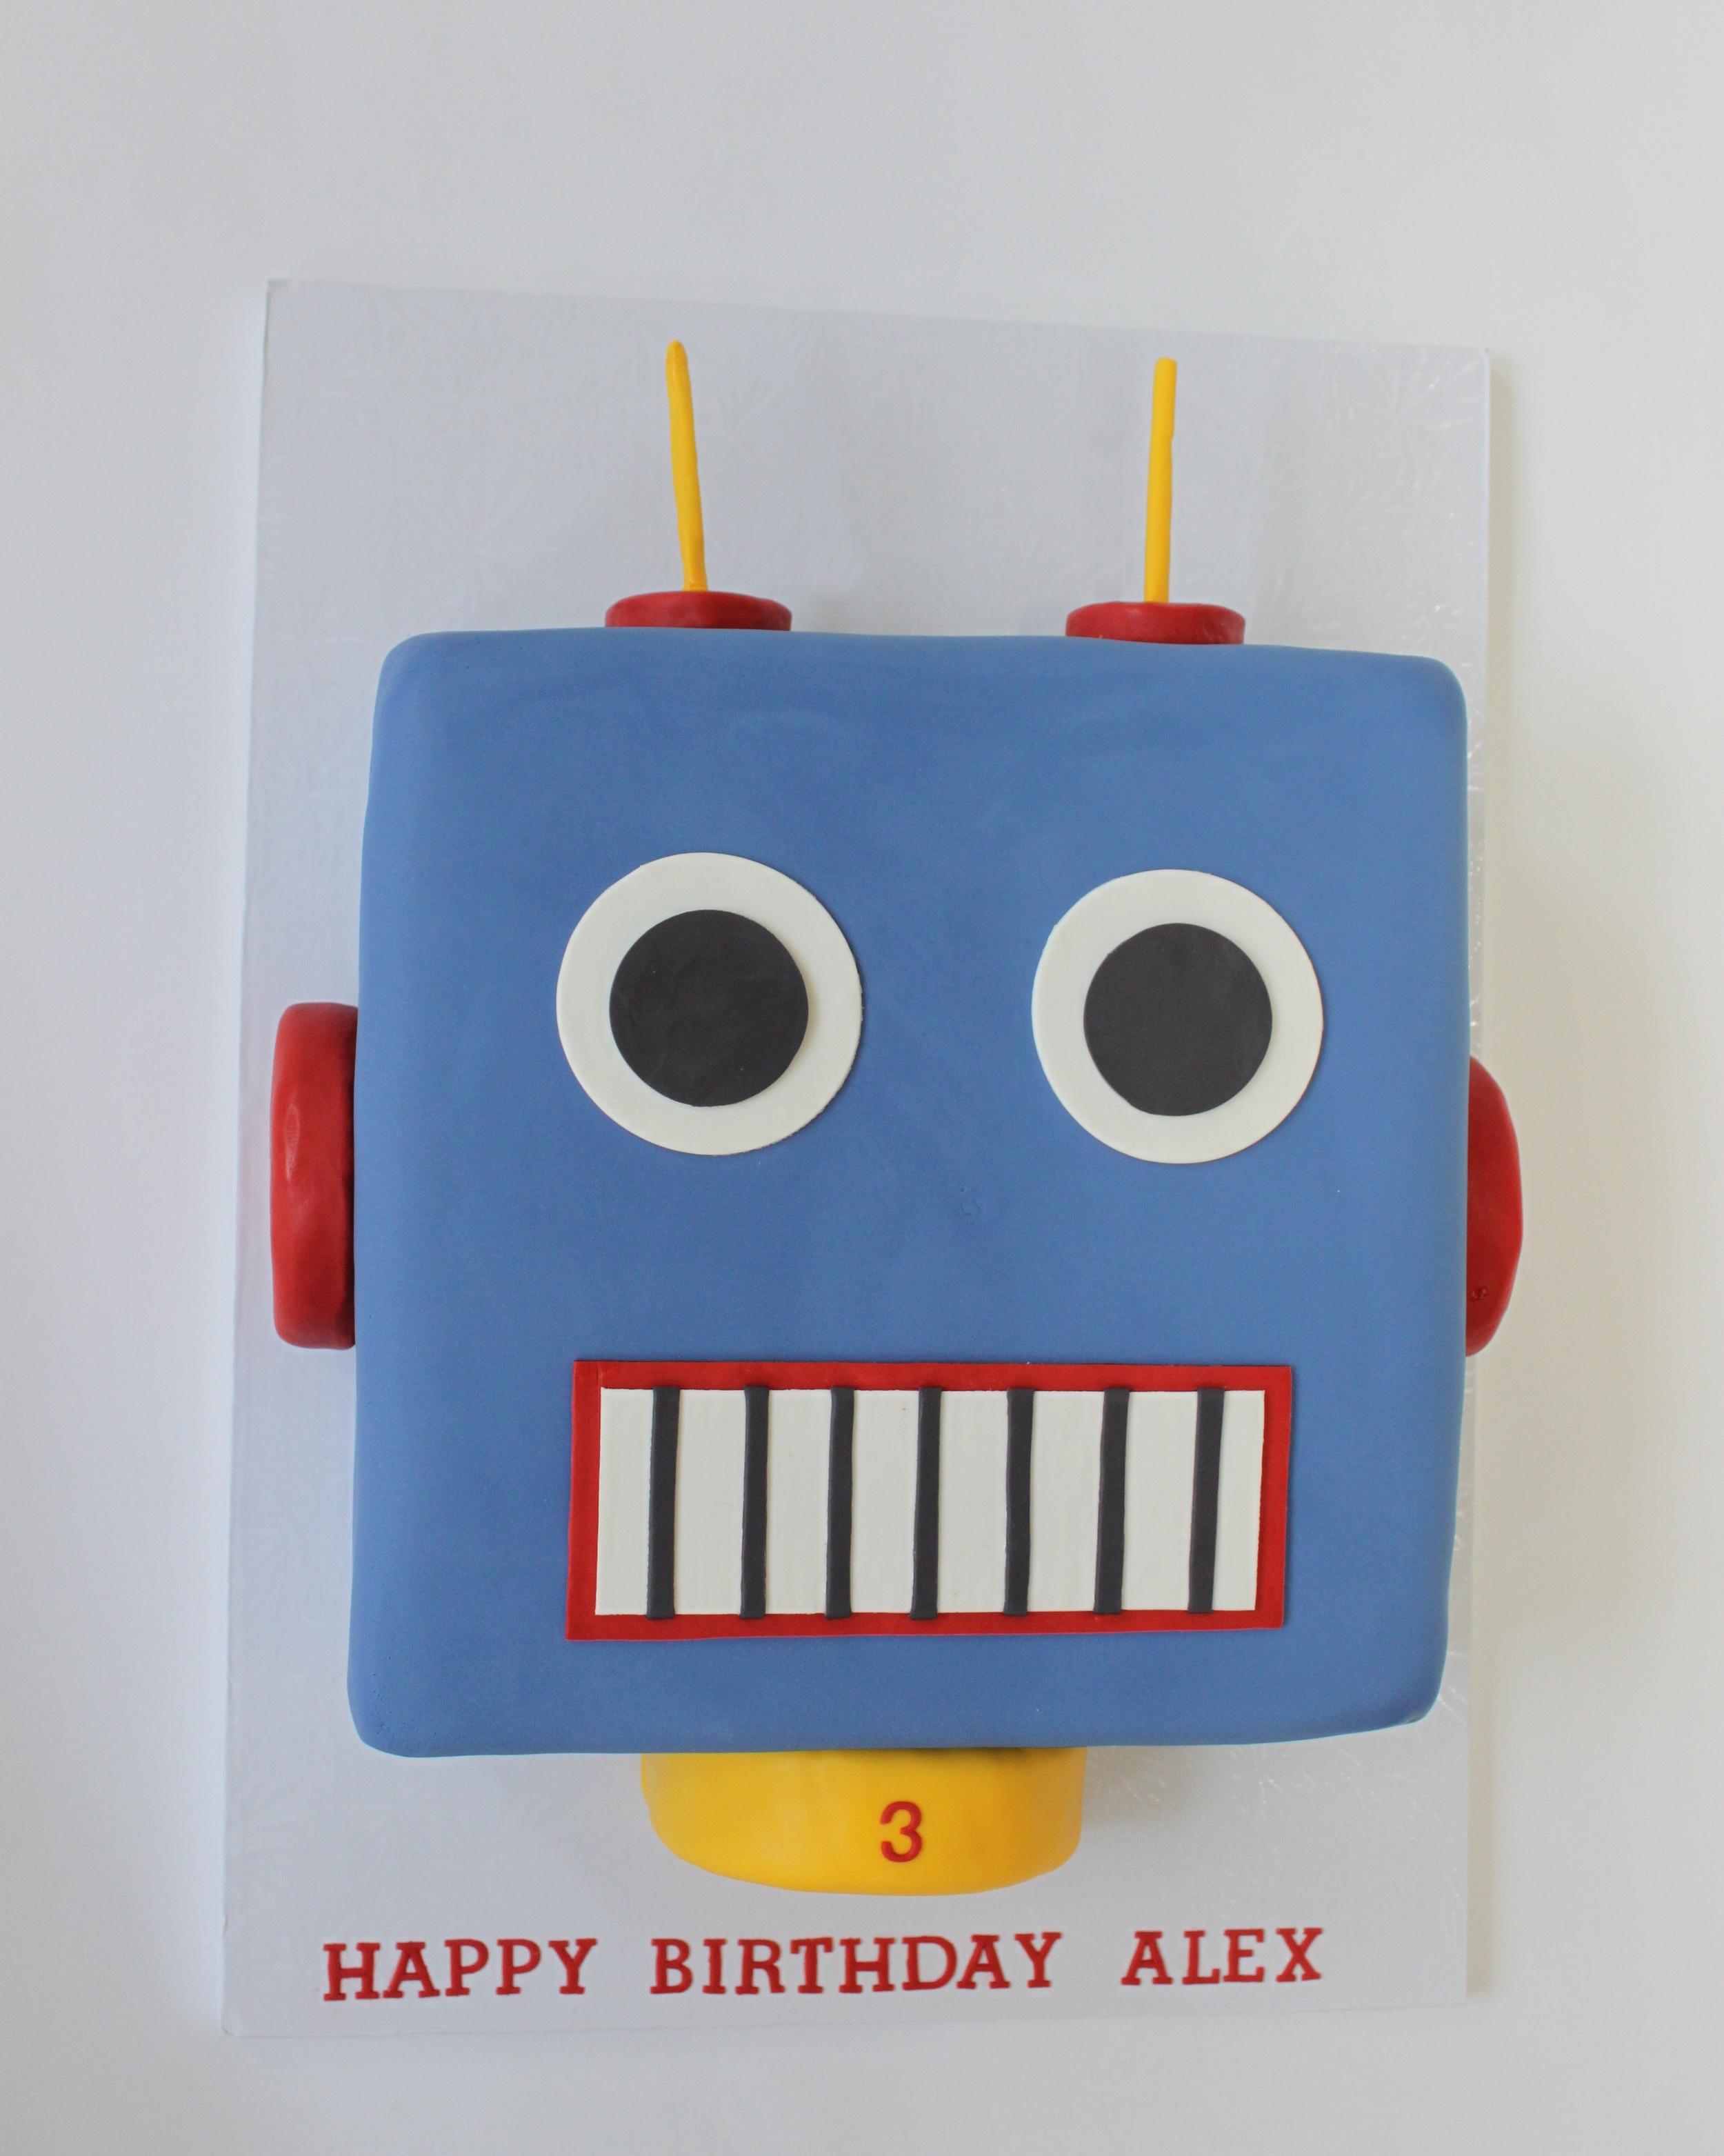 Retro Robot cake 9827 (1).jpg